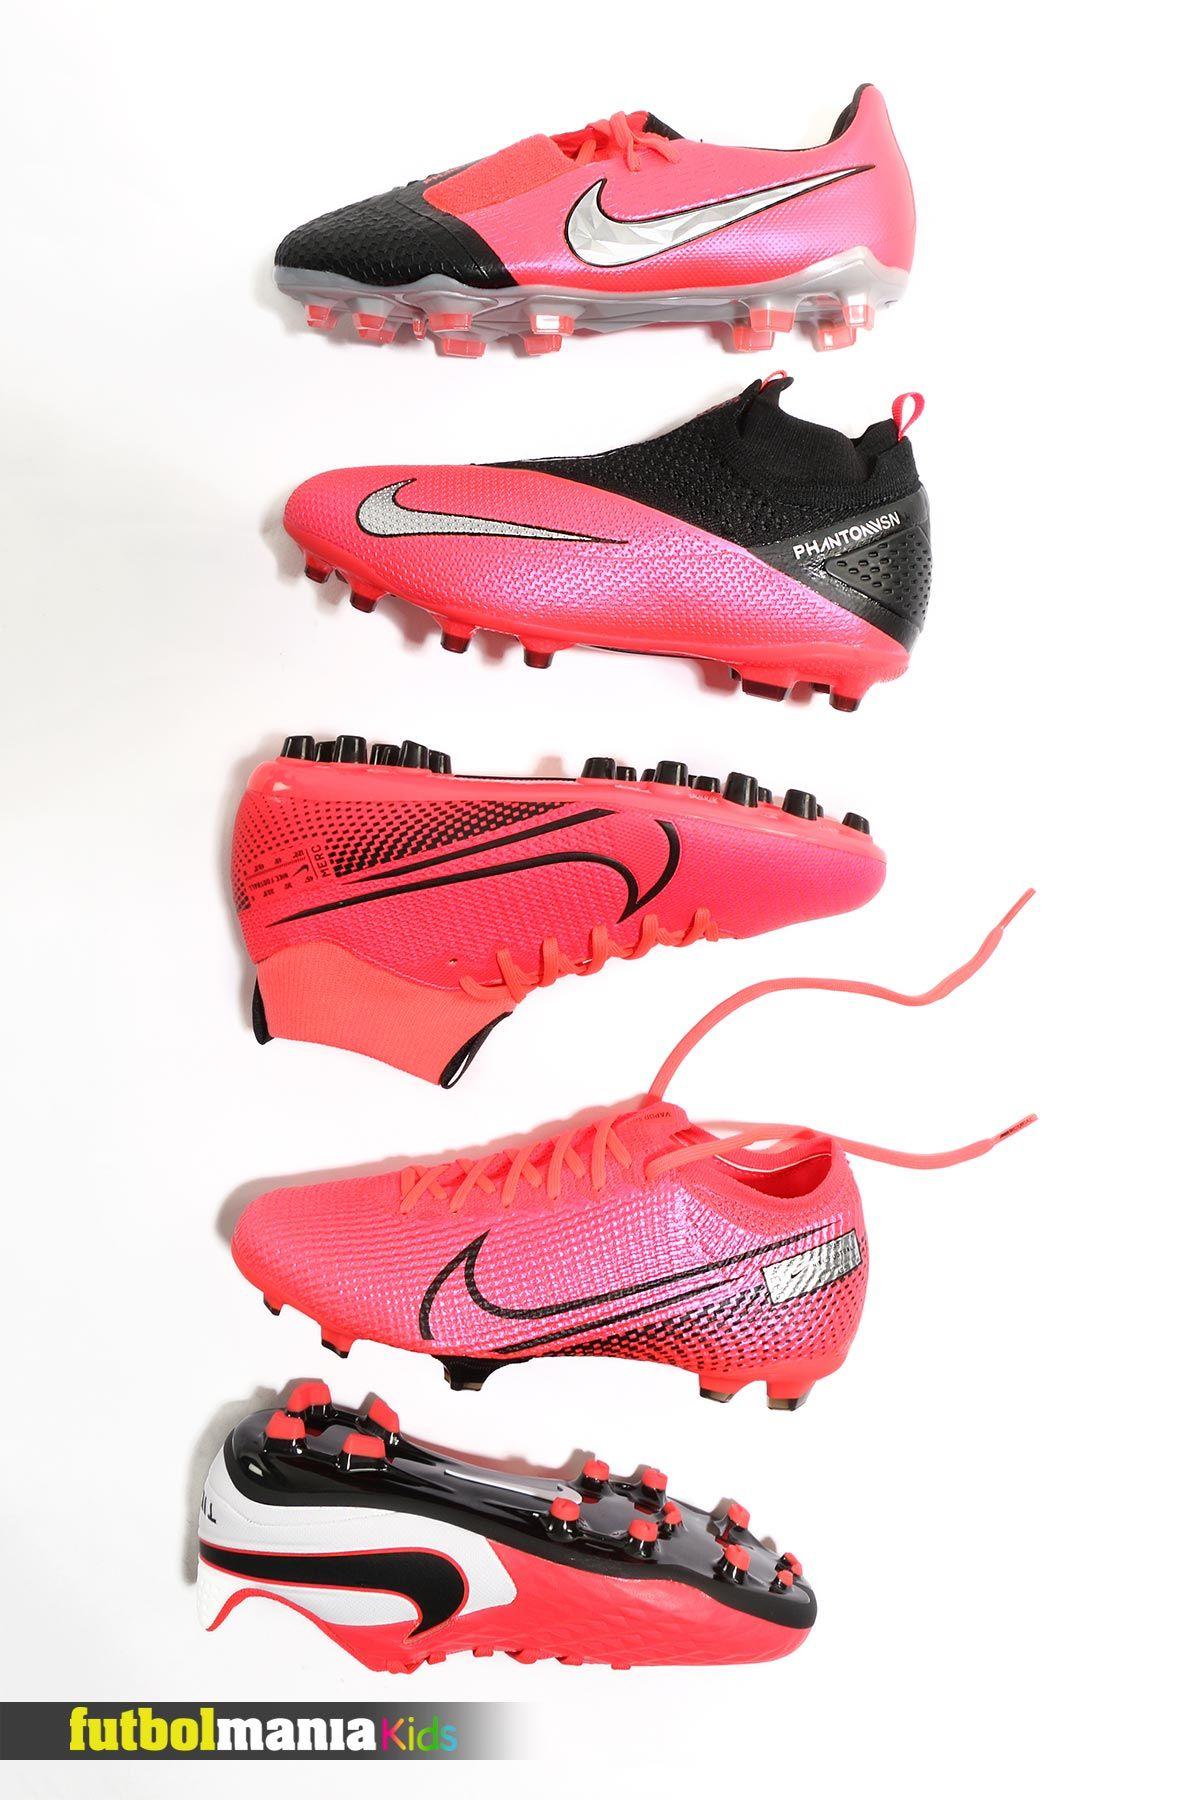 Refrescante traición conversacion  Botas de fútbol Nike | Nike fútbol, Zapatos de futbol rapido, Botas de futbol  nike